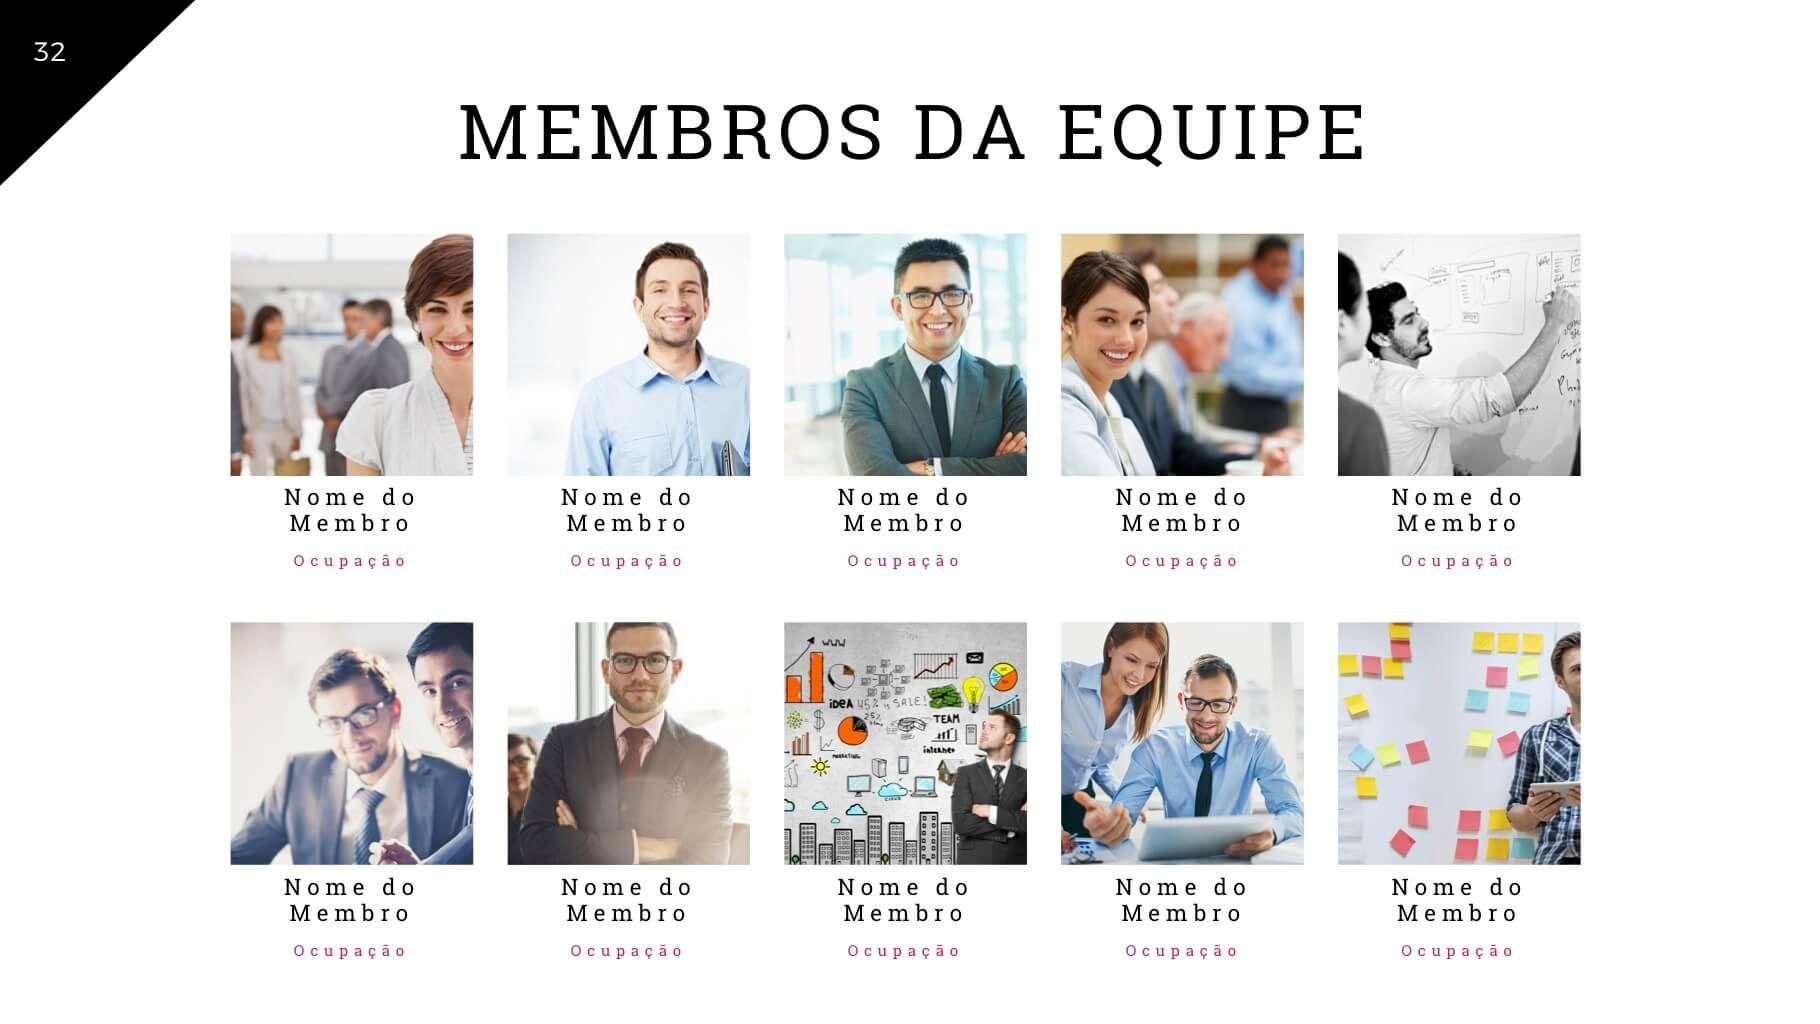 Apresentacao De Empresa Corporate Tema De Powerpoint Com Imagens